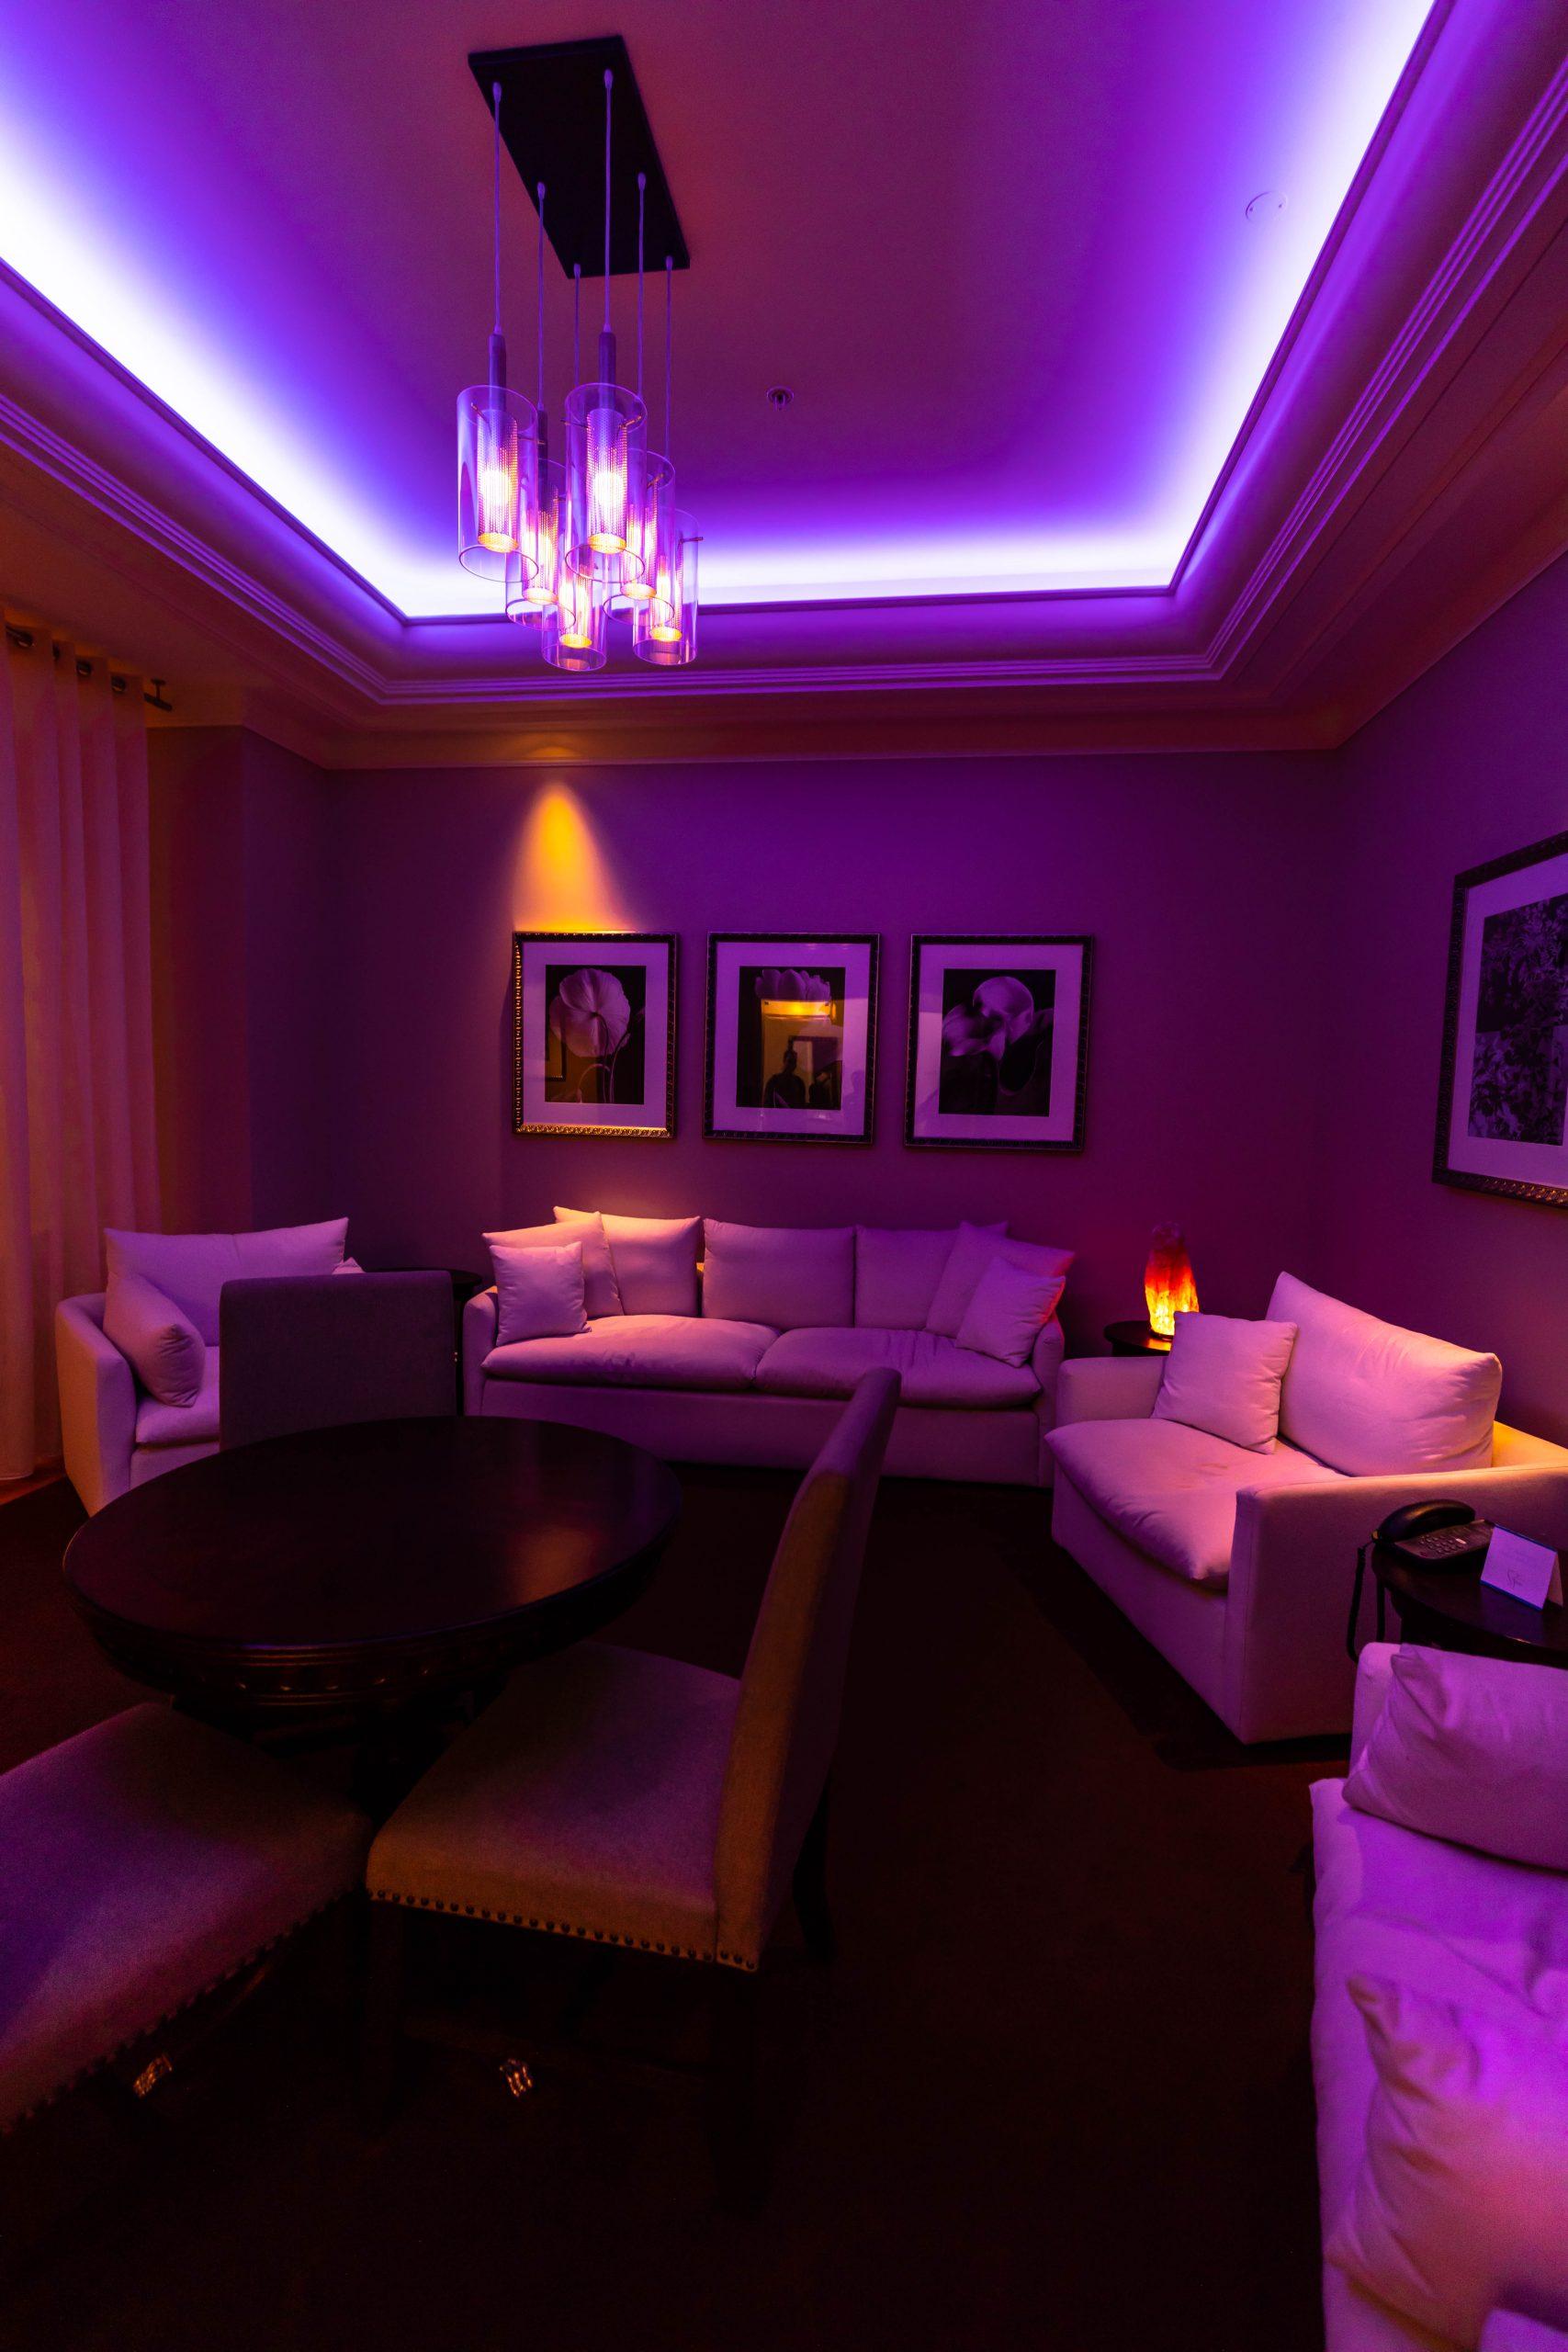 Waldorf Astoria Orlando Spa Lounge Room Photographed y Annie Fairfax Florida Luxury Spas of the World